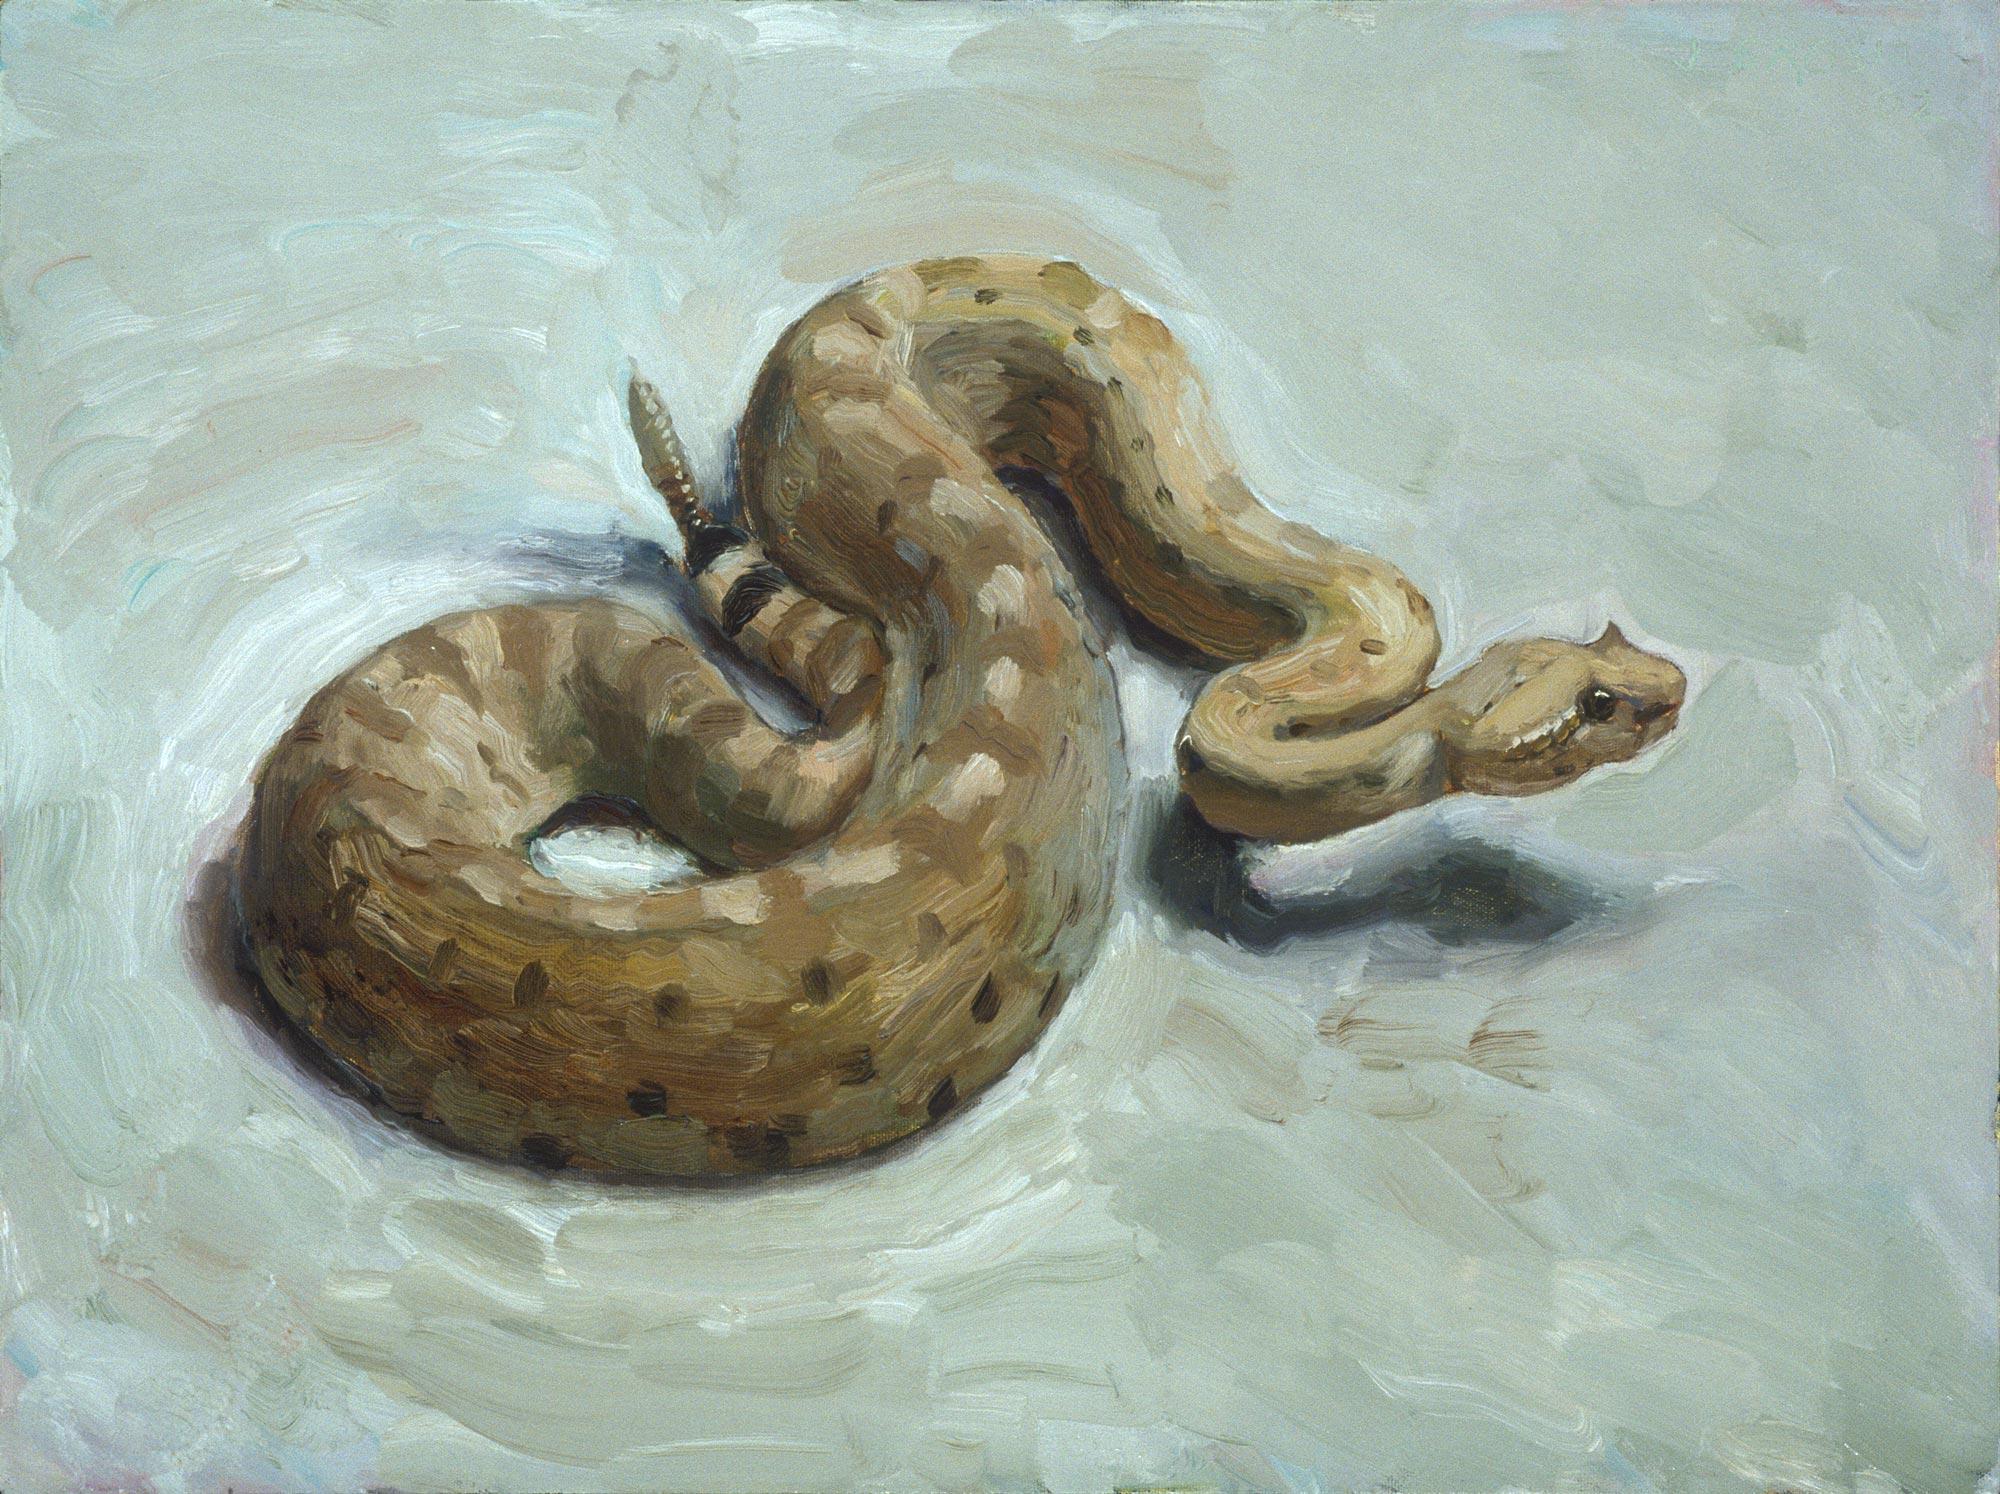 Rattlesnake 2, 18 x 24, oil on canvas, 2002